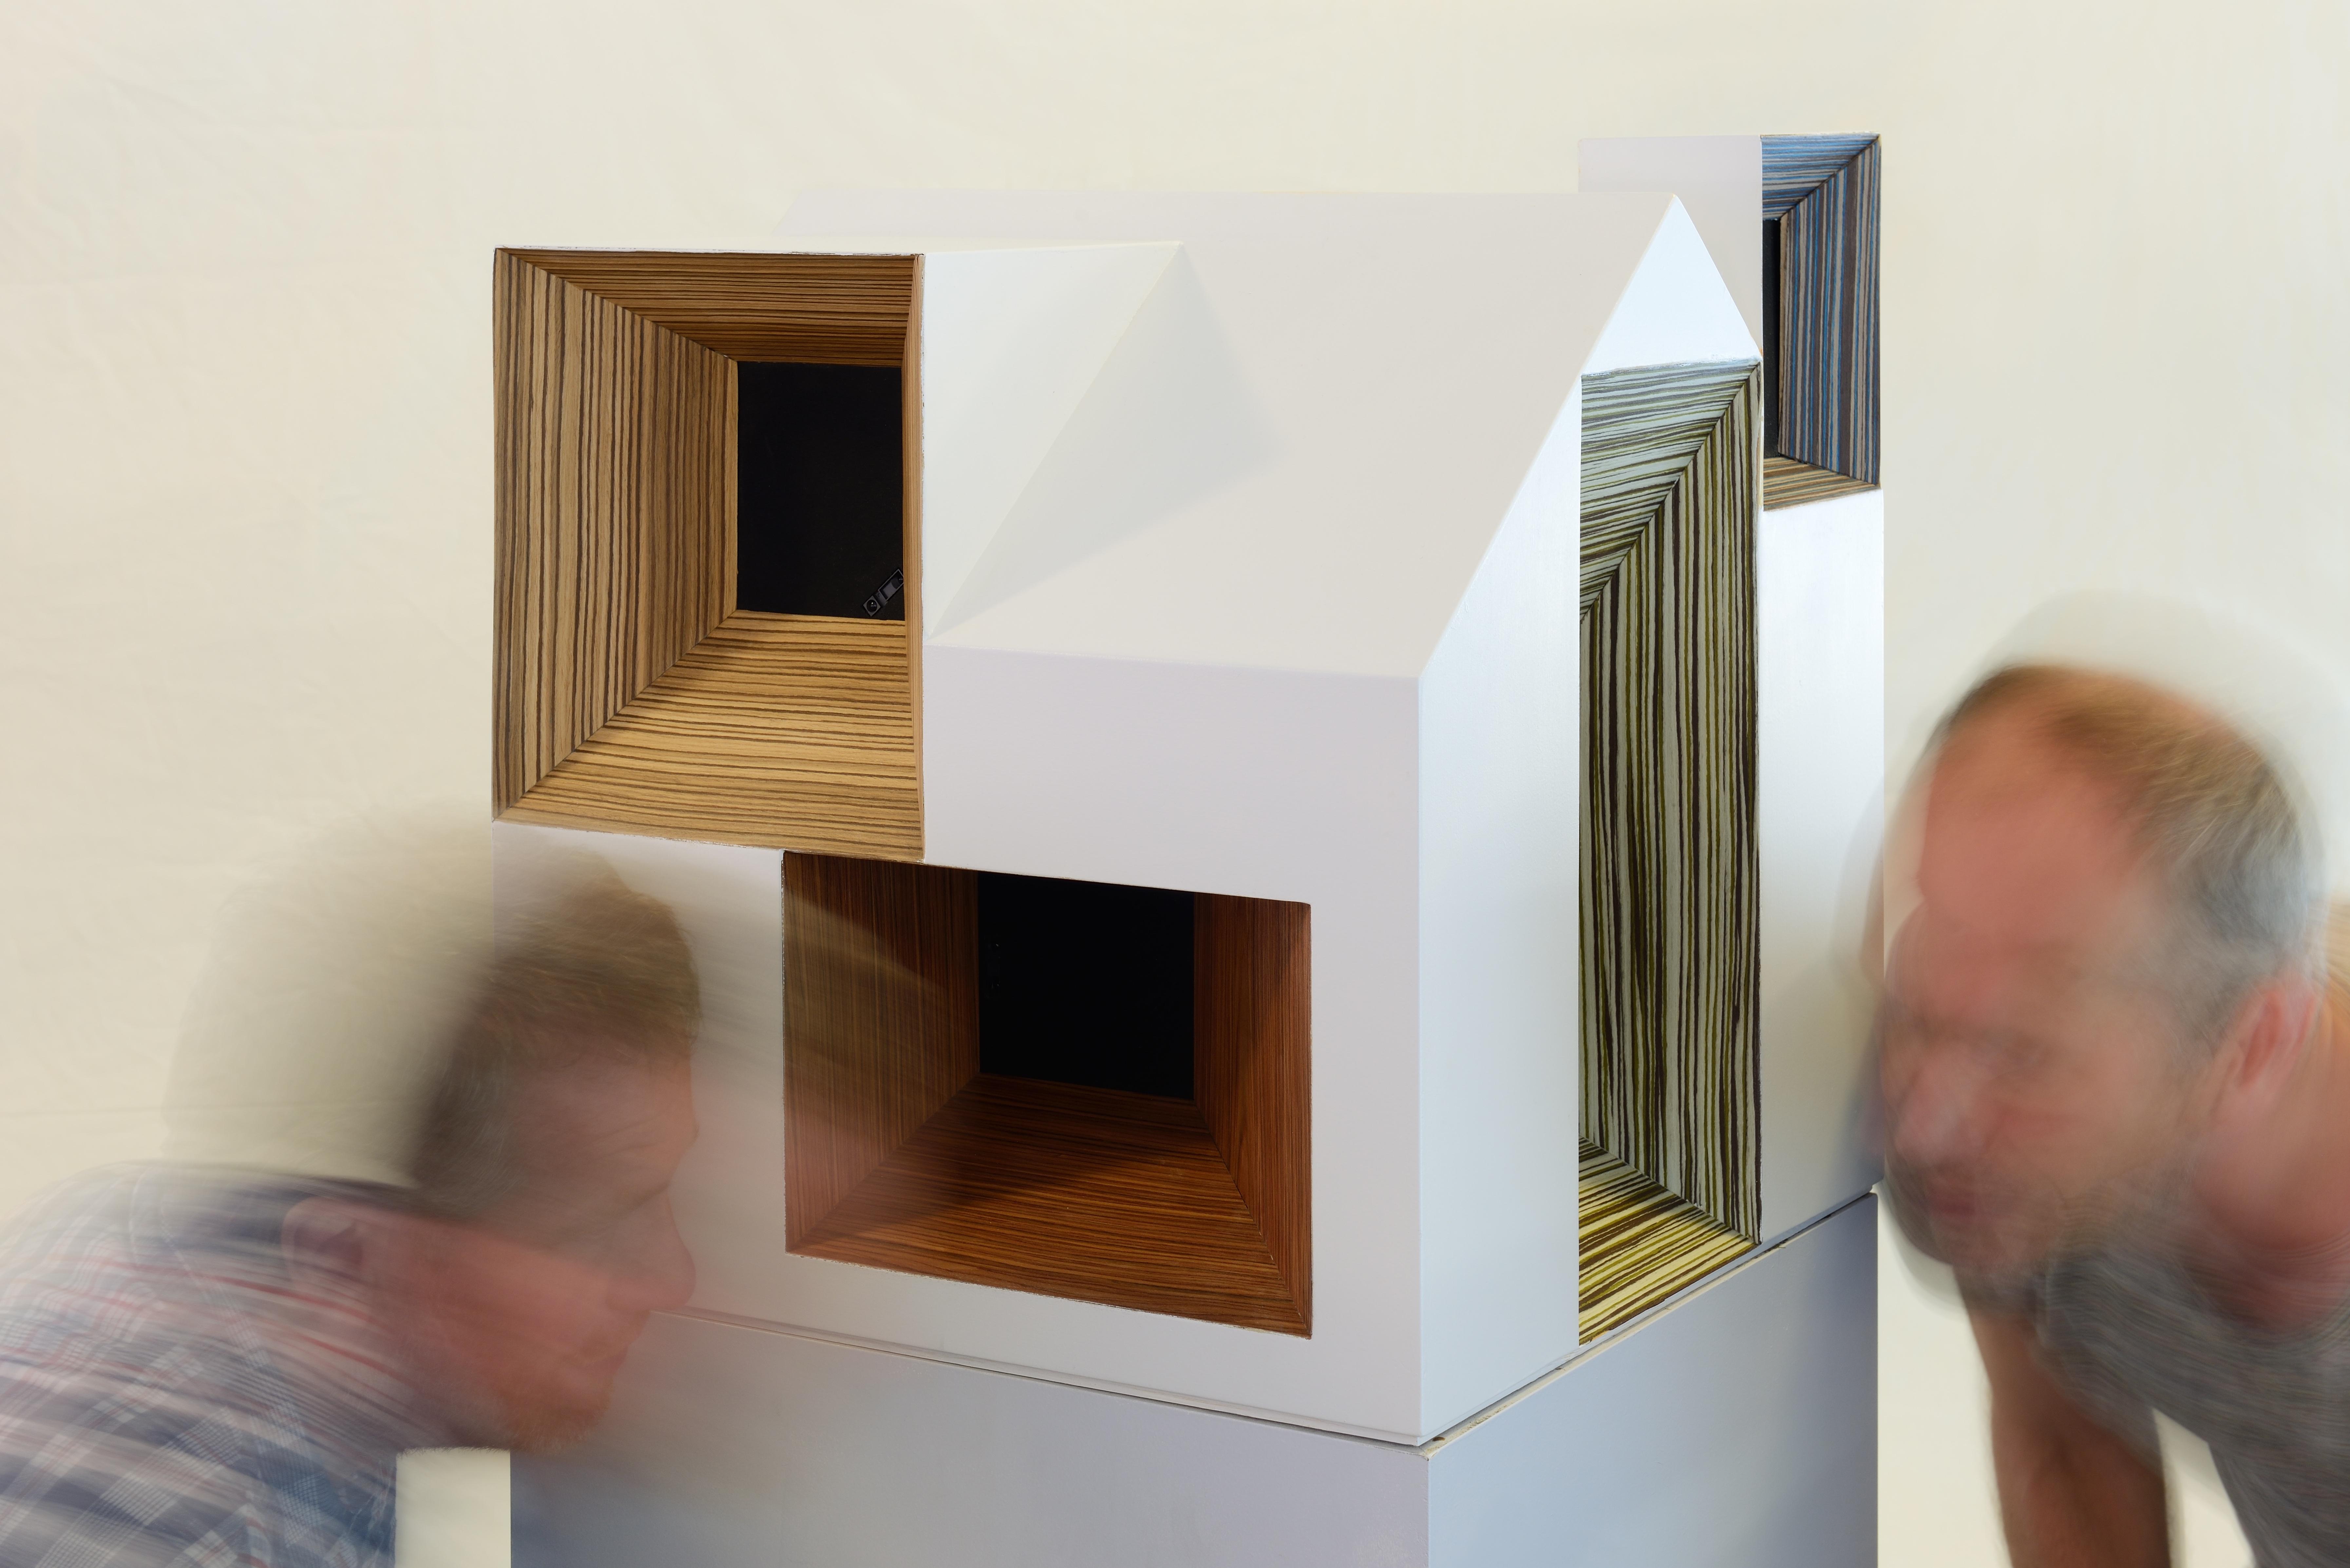 the listening house (2017), BKKC